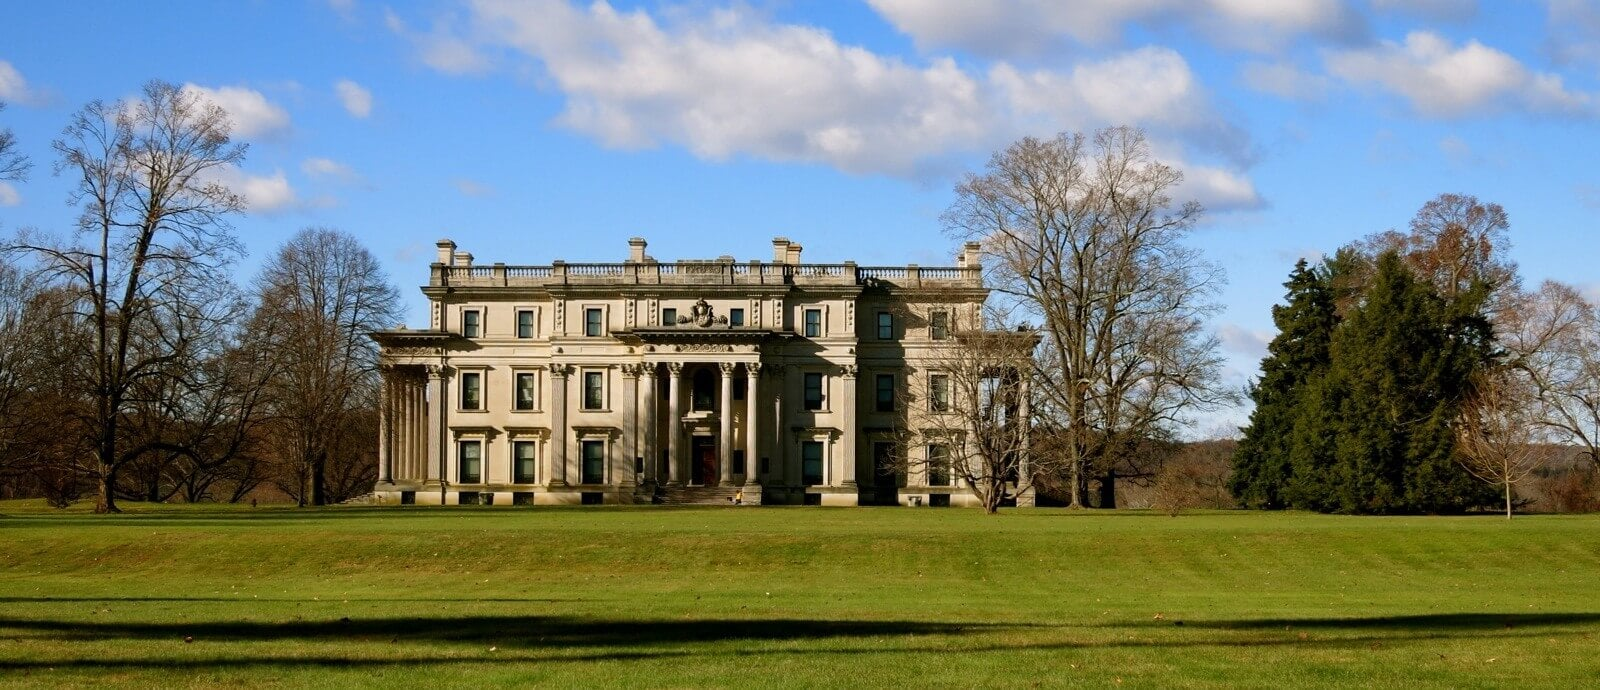 60.Vanderbilt Mansion